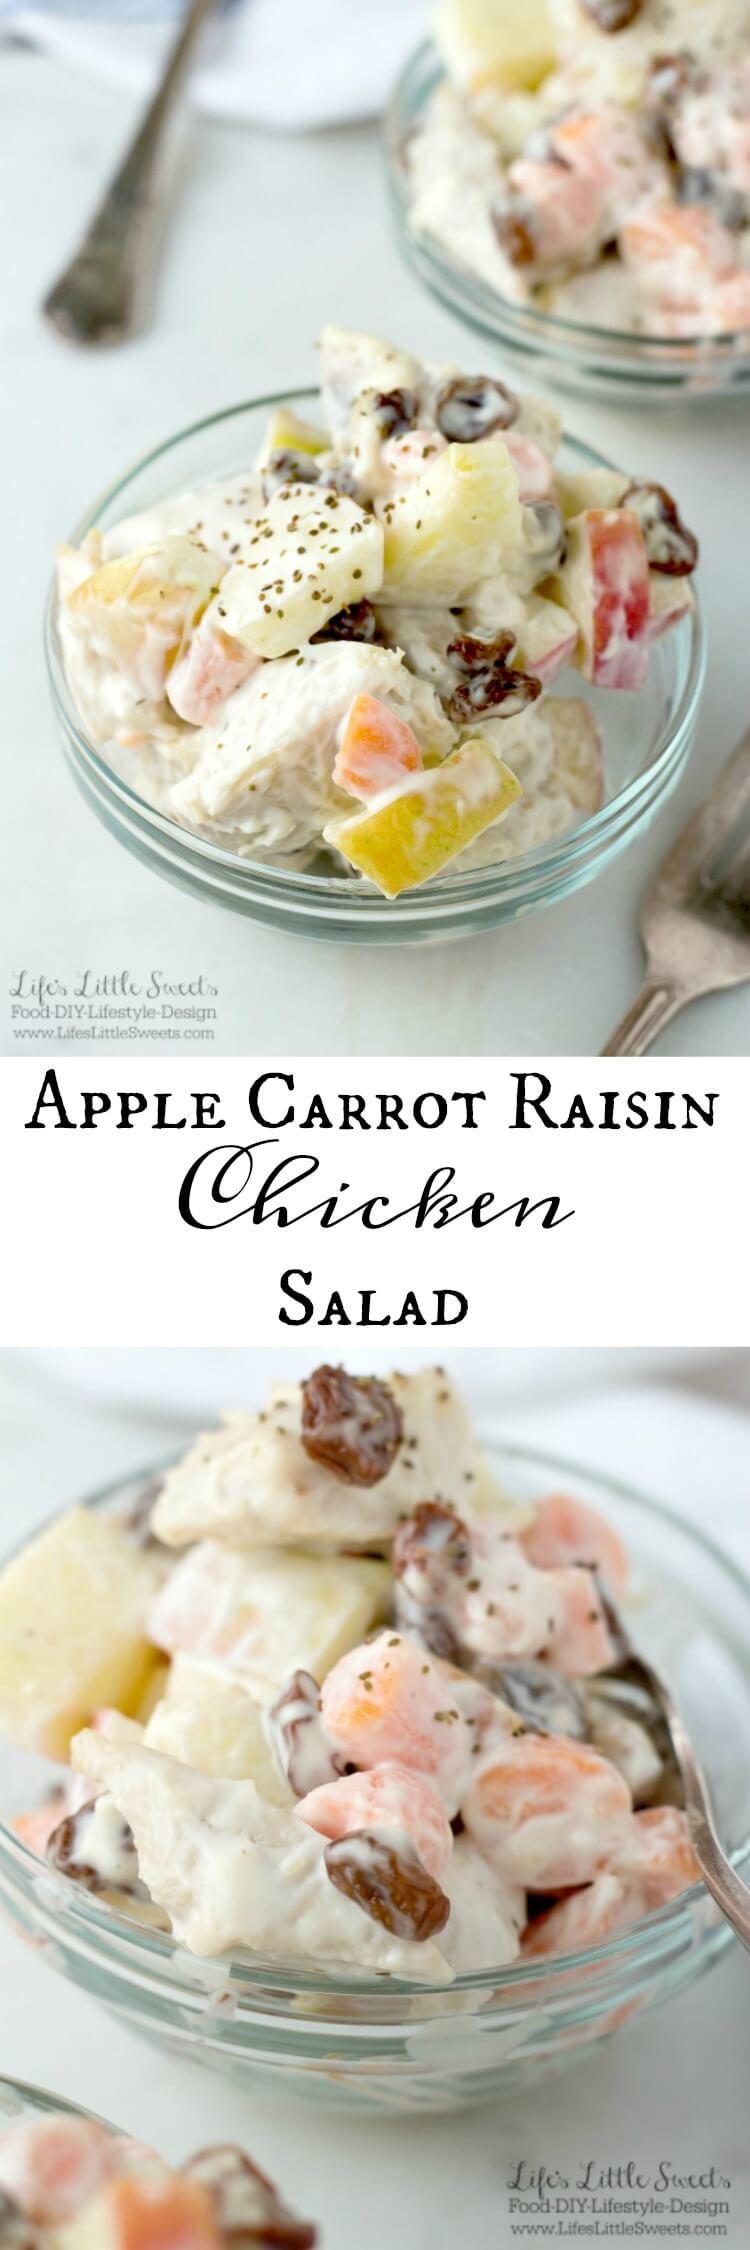 Apple Carrot Raisin Chicken Salad www.LifesLittleSweets.com